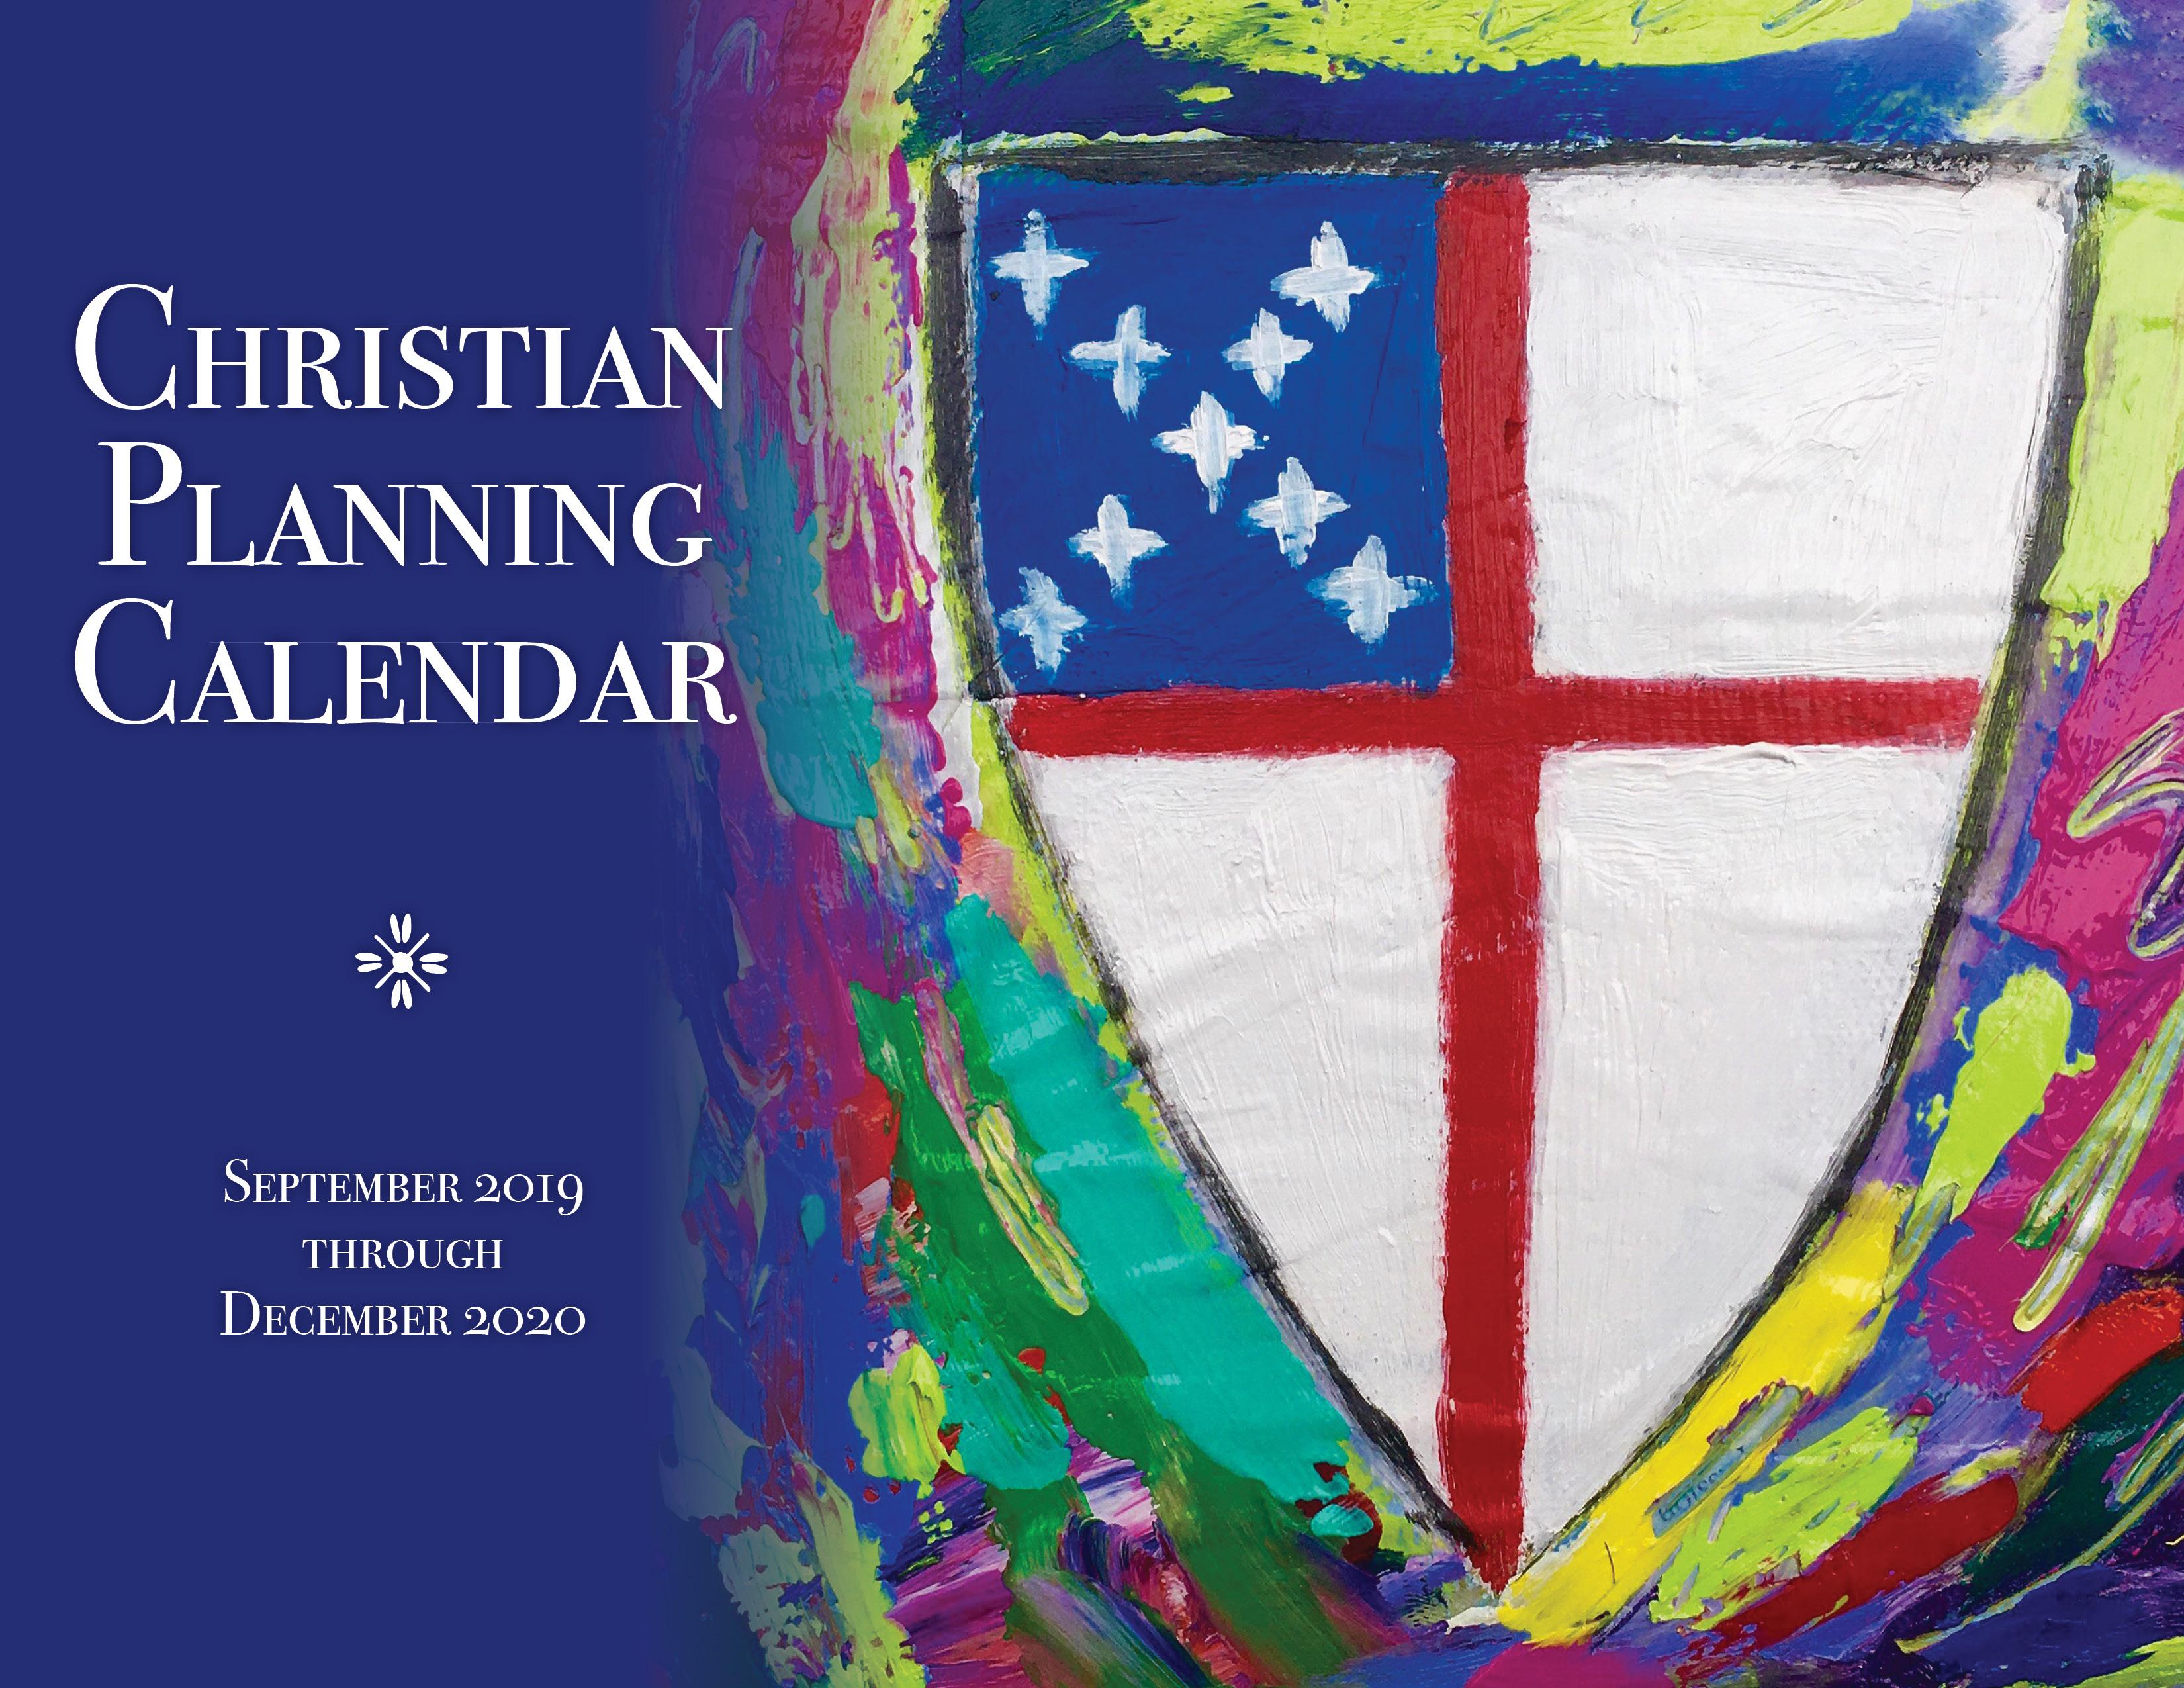 ChurchPublishing org: Christian Planning Calendar 2019-2020